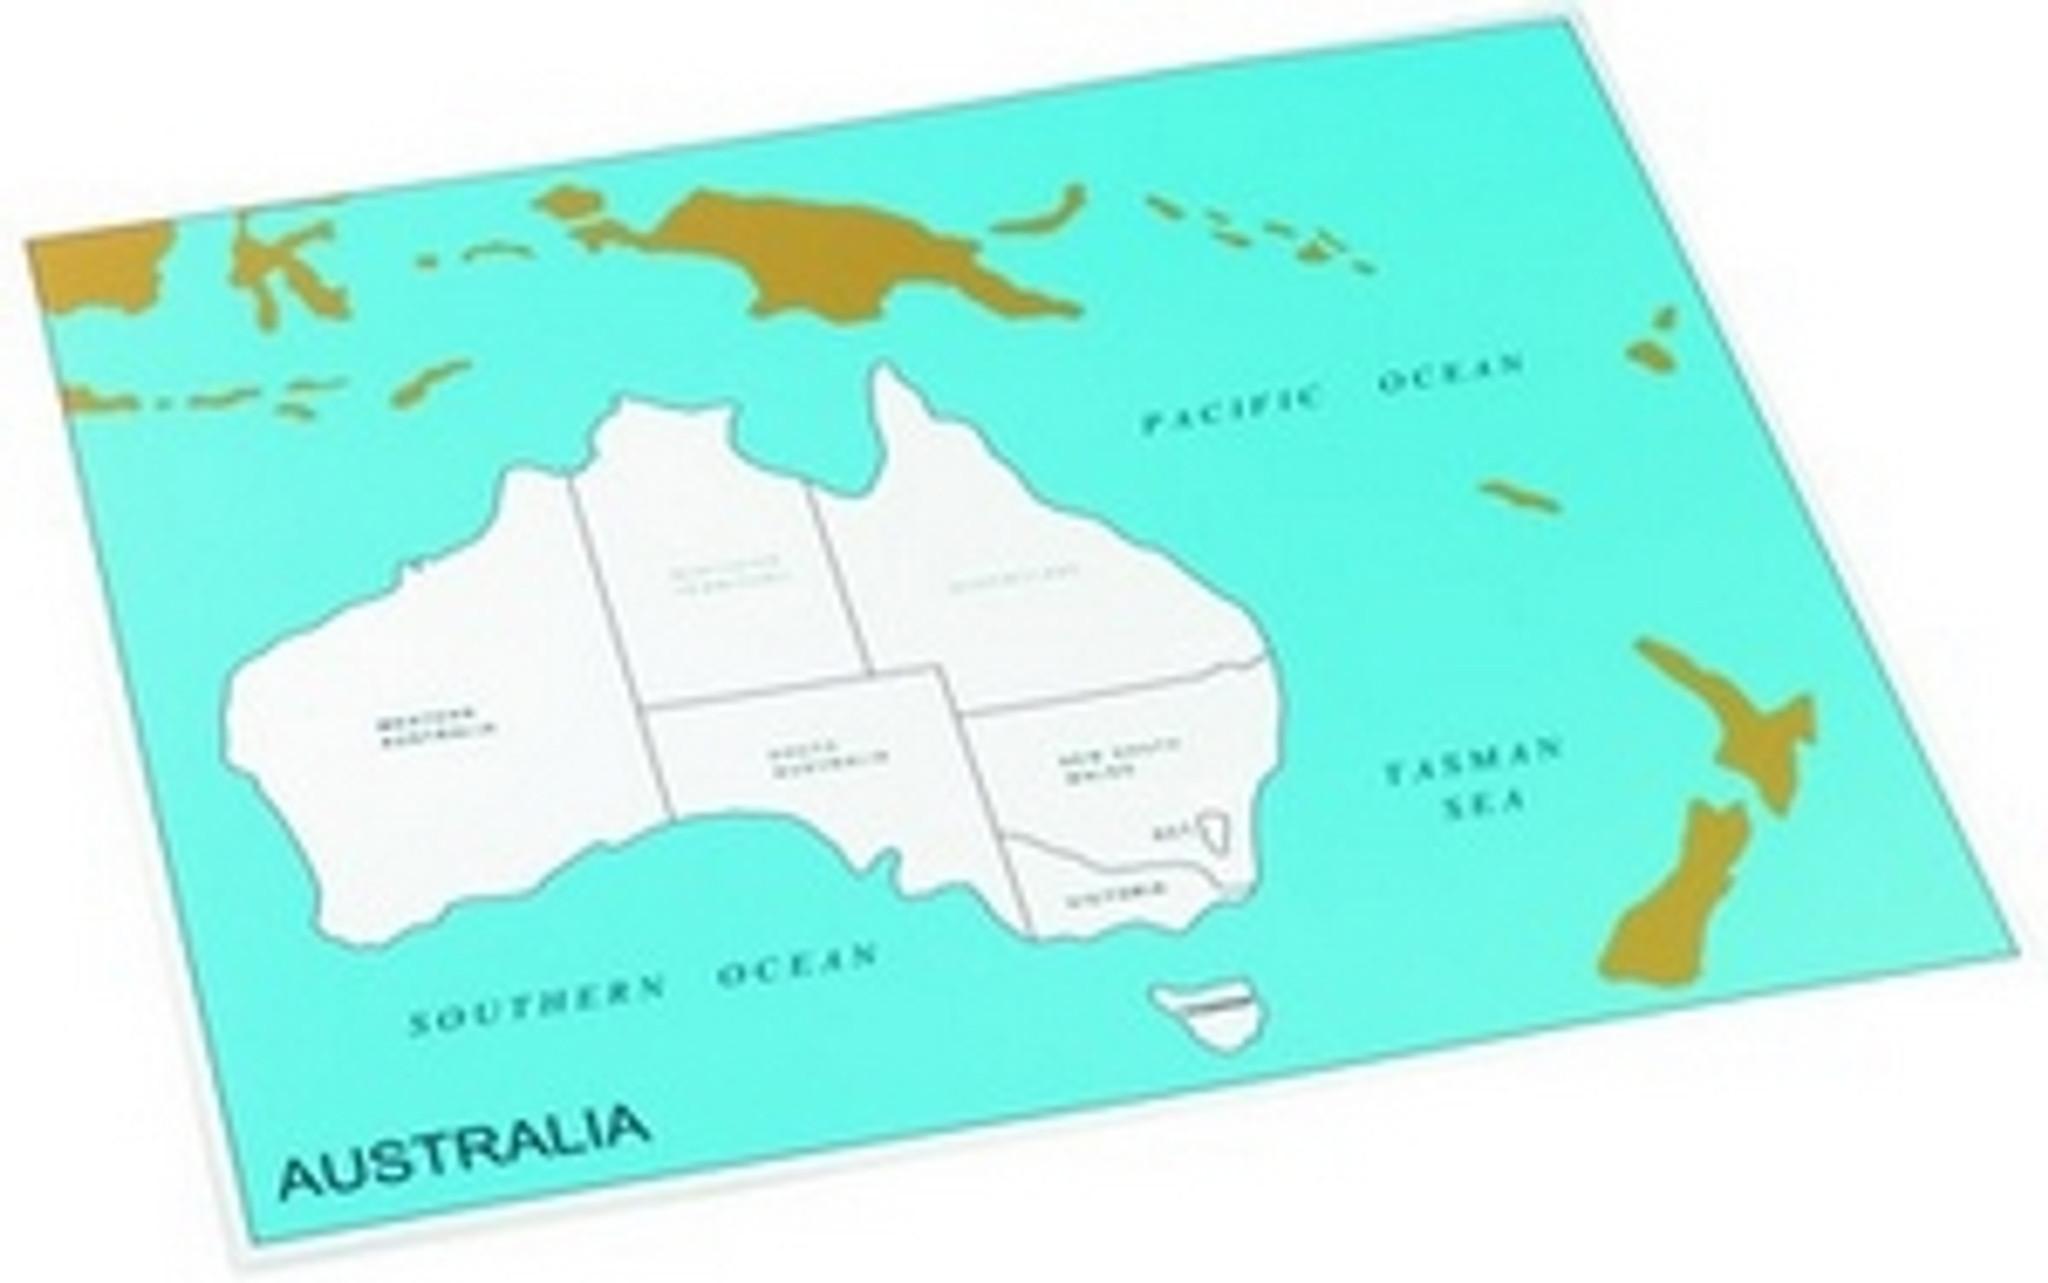 Control chart of Australia, states